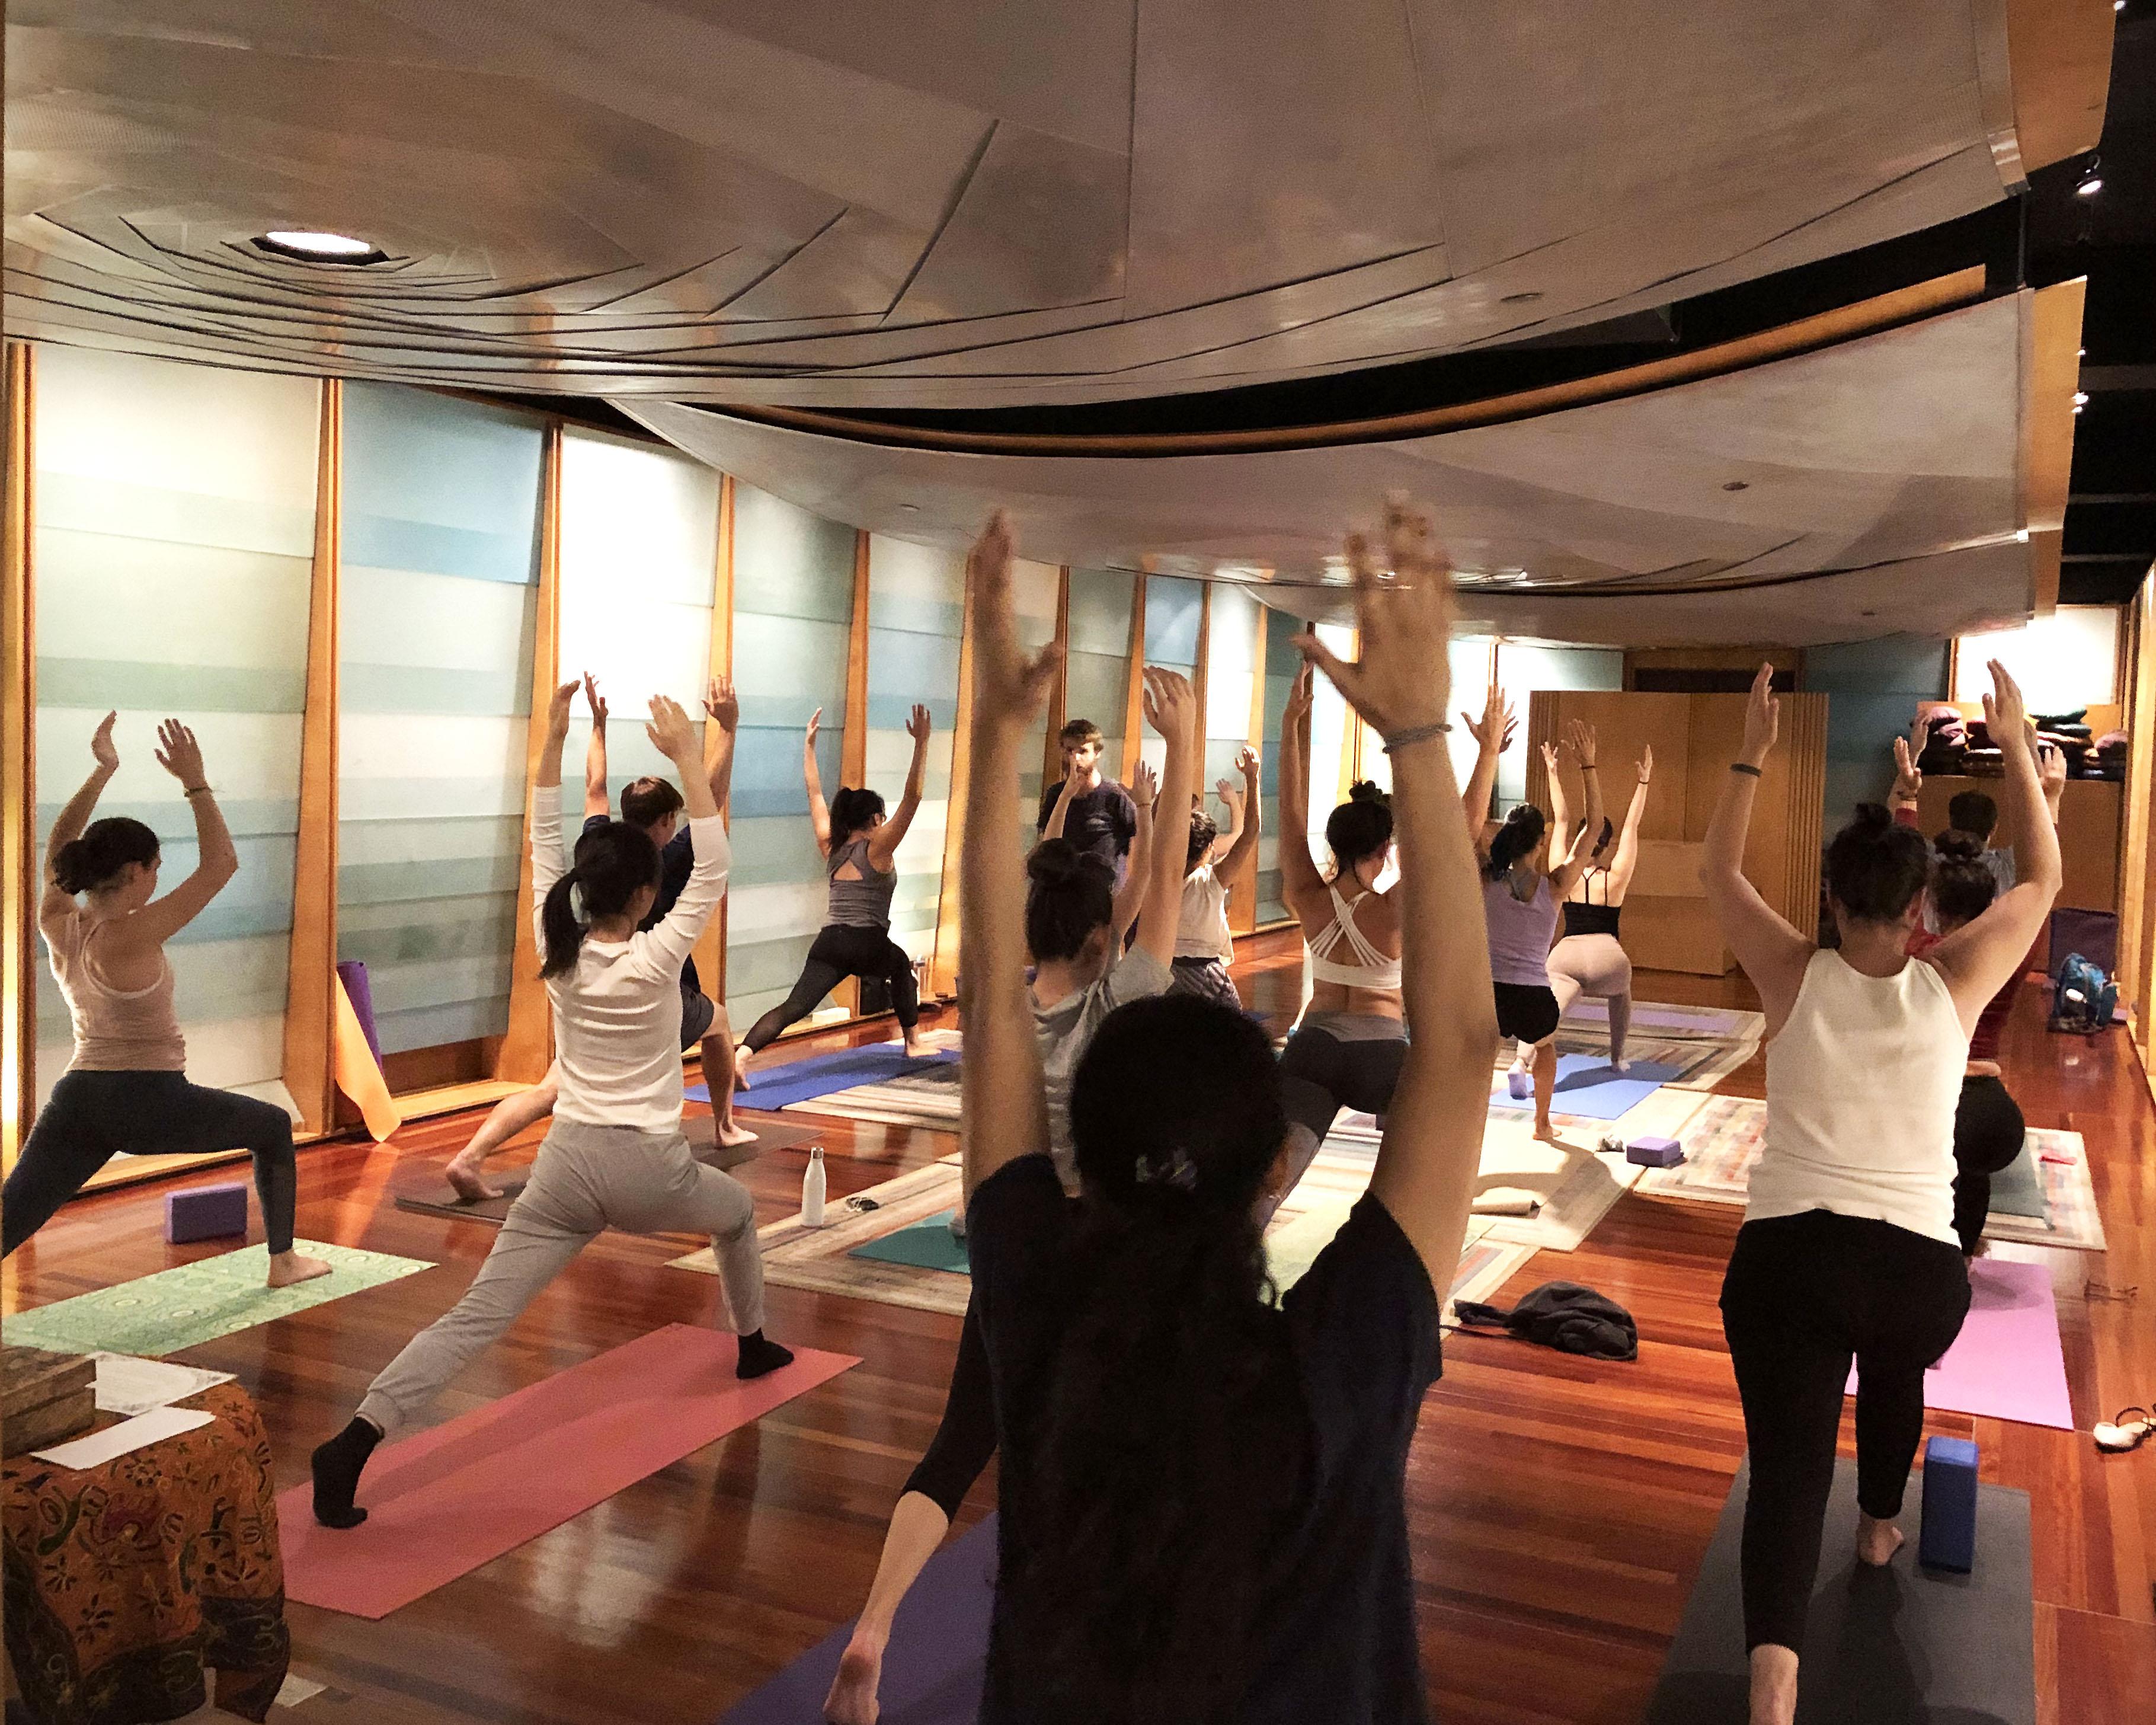 2020-02-24_5e541404c2d79_Yoga_1